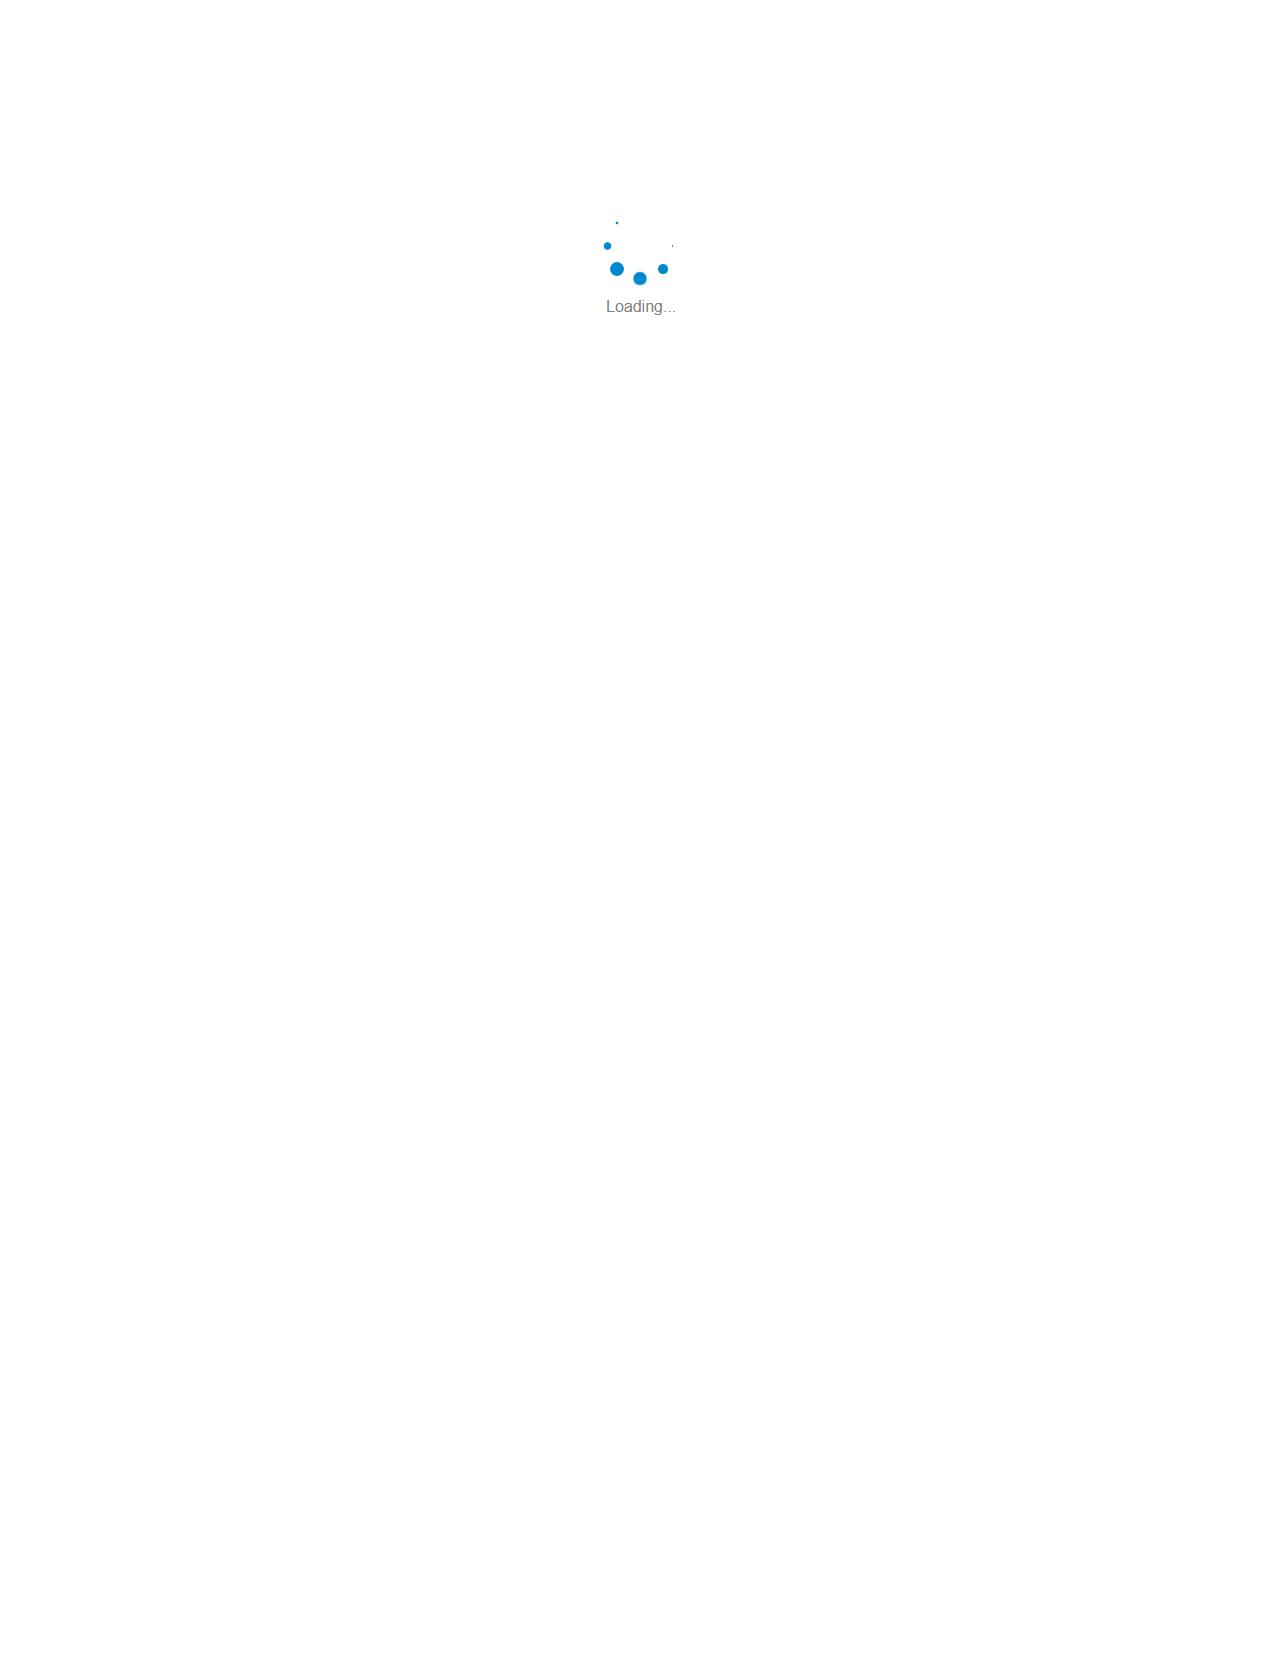 Screenshot Desktop - https://smarthome-dev.eco-system.ch/